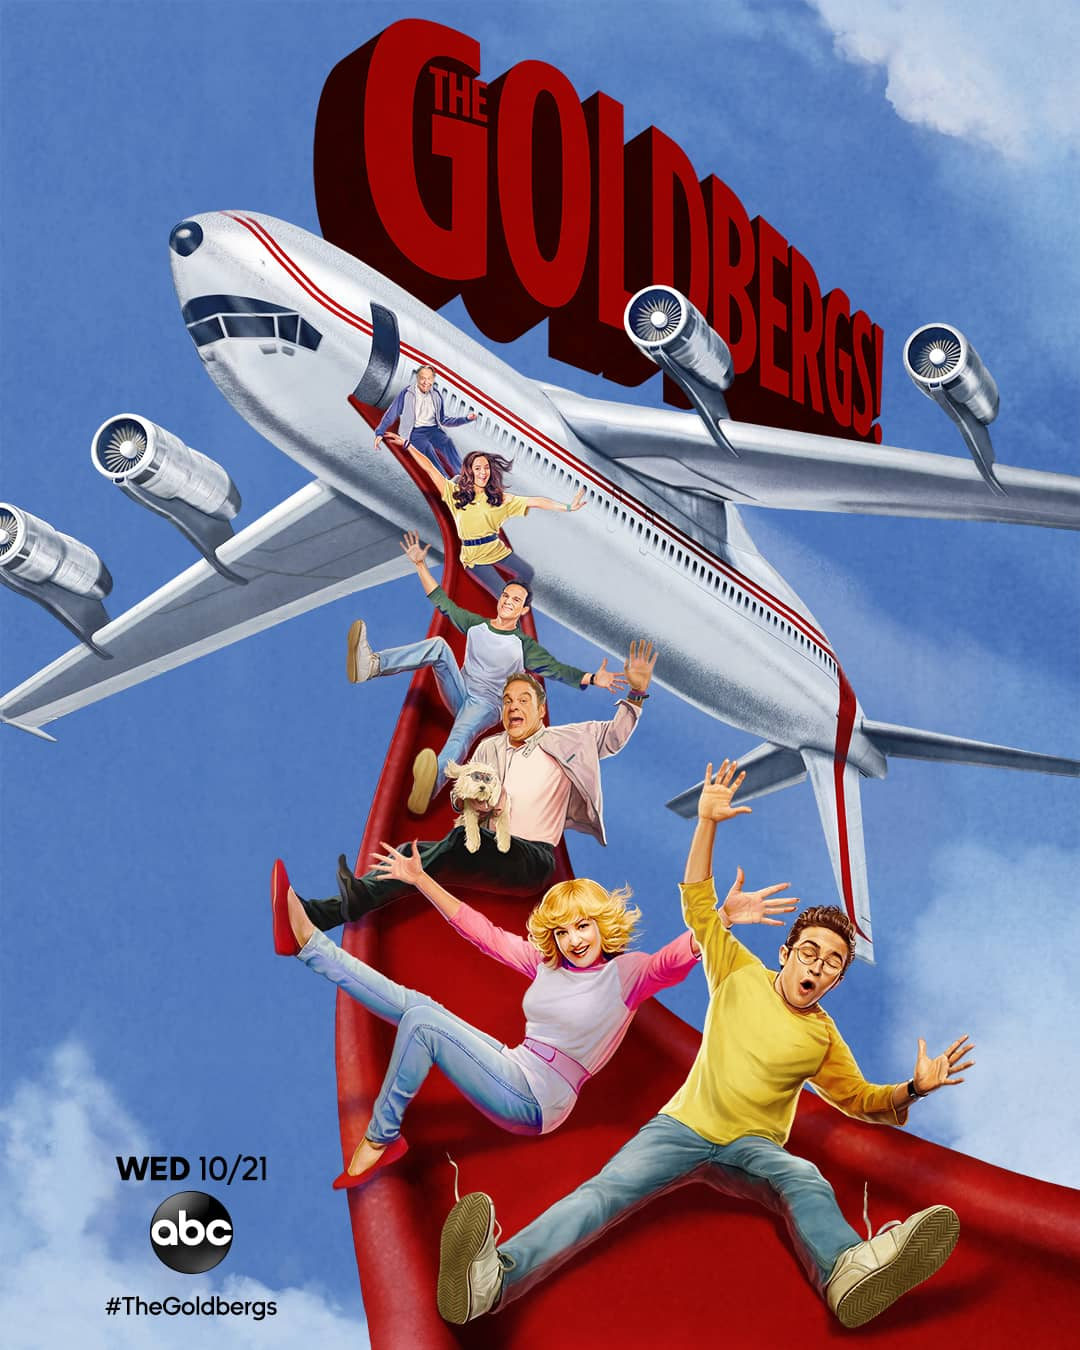 THE GOLDBERGS Season 8 Poster Key Art